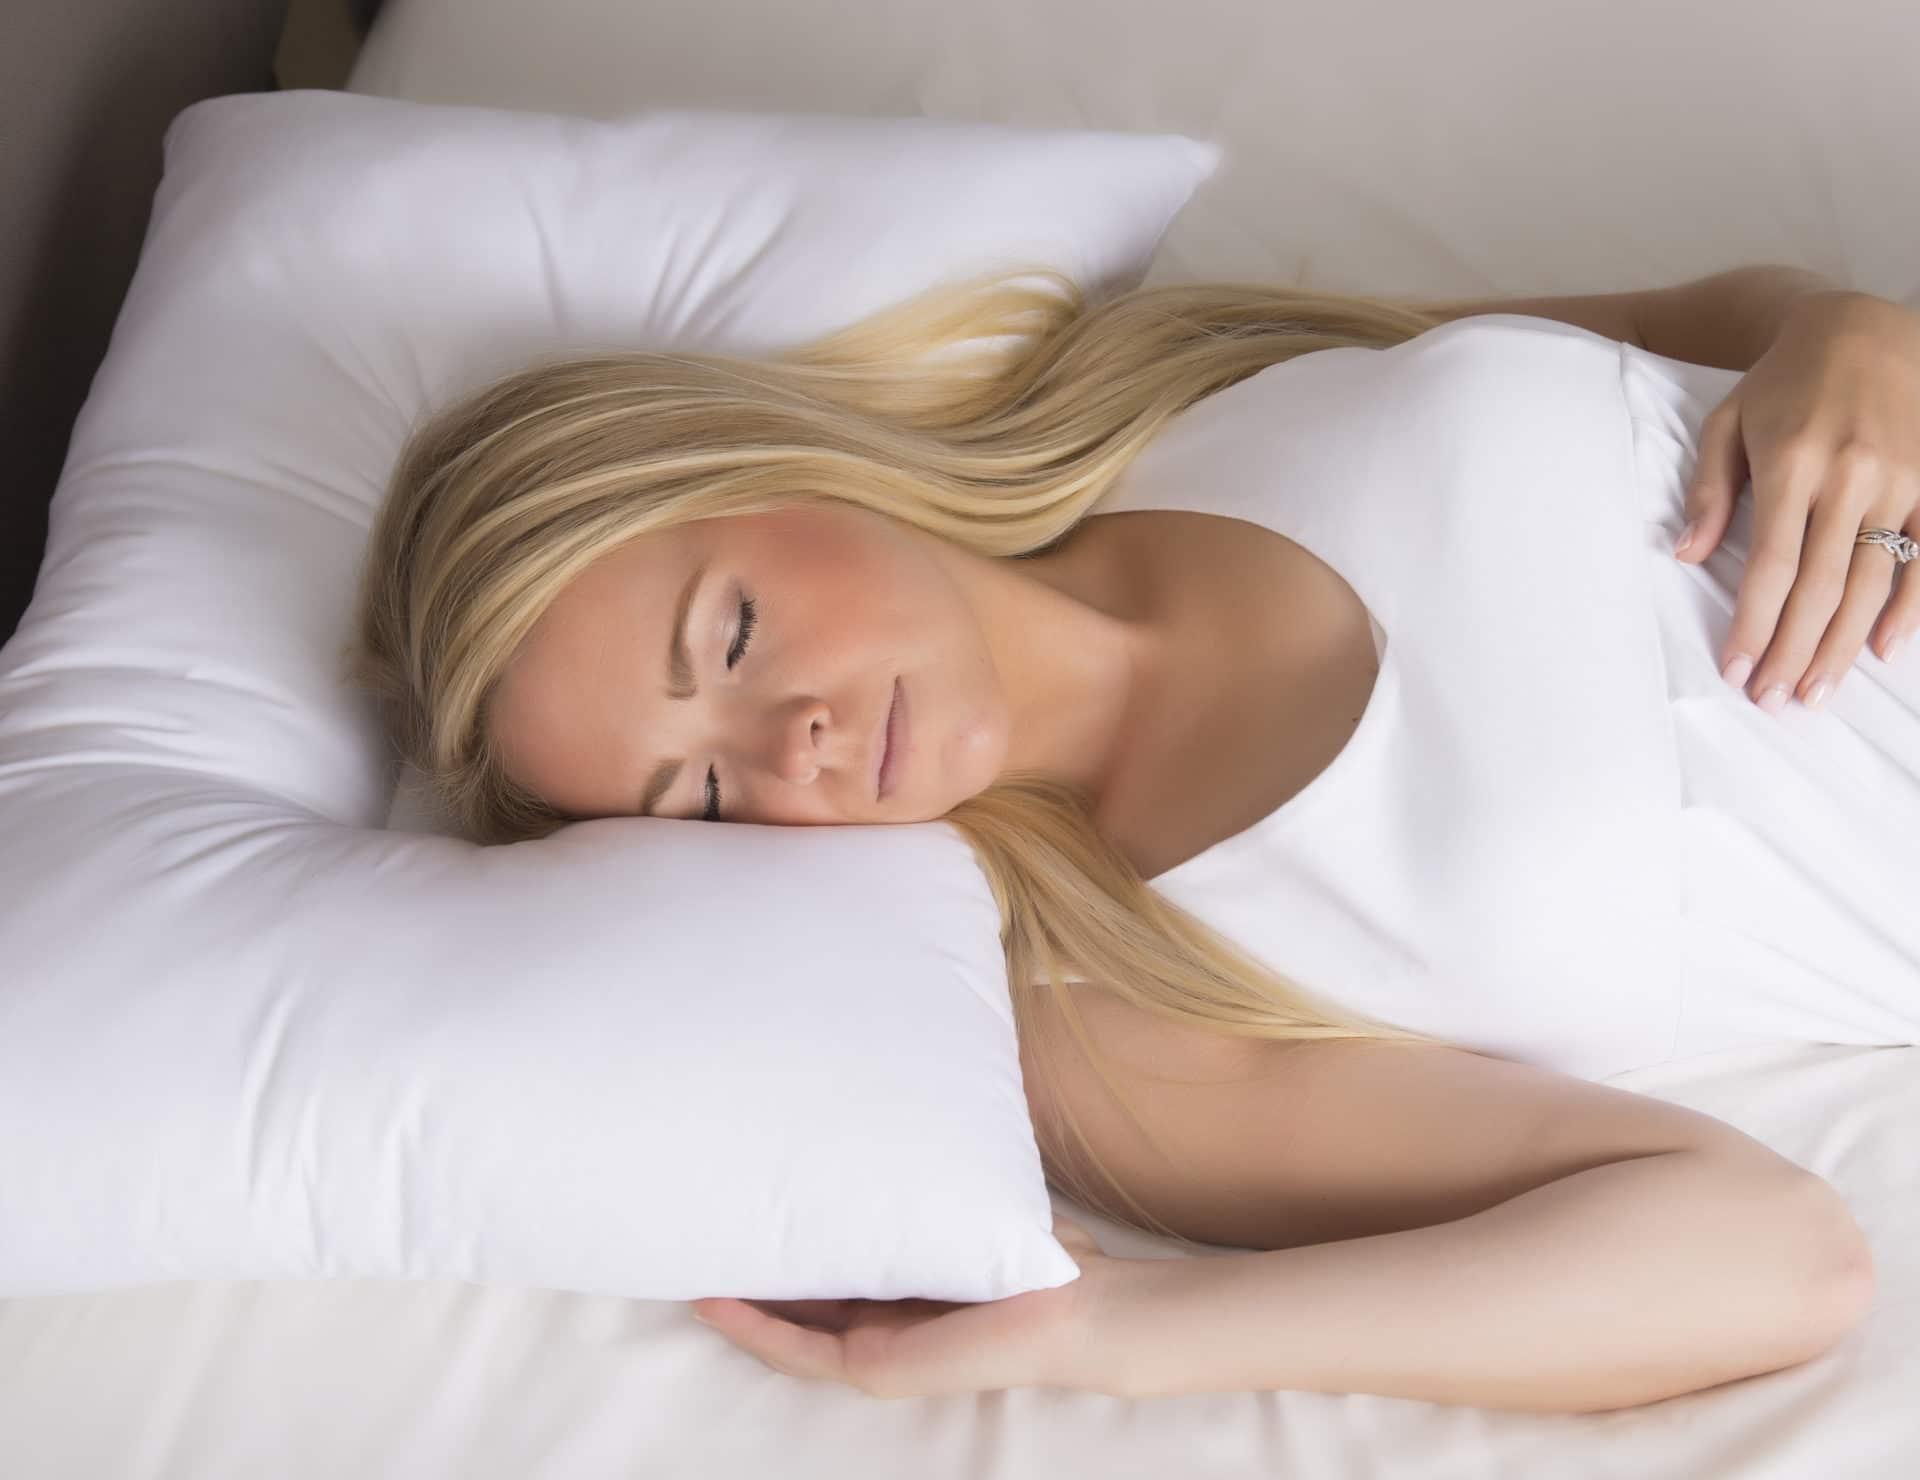 donut neck pillow fill station